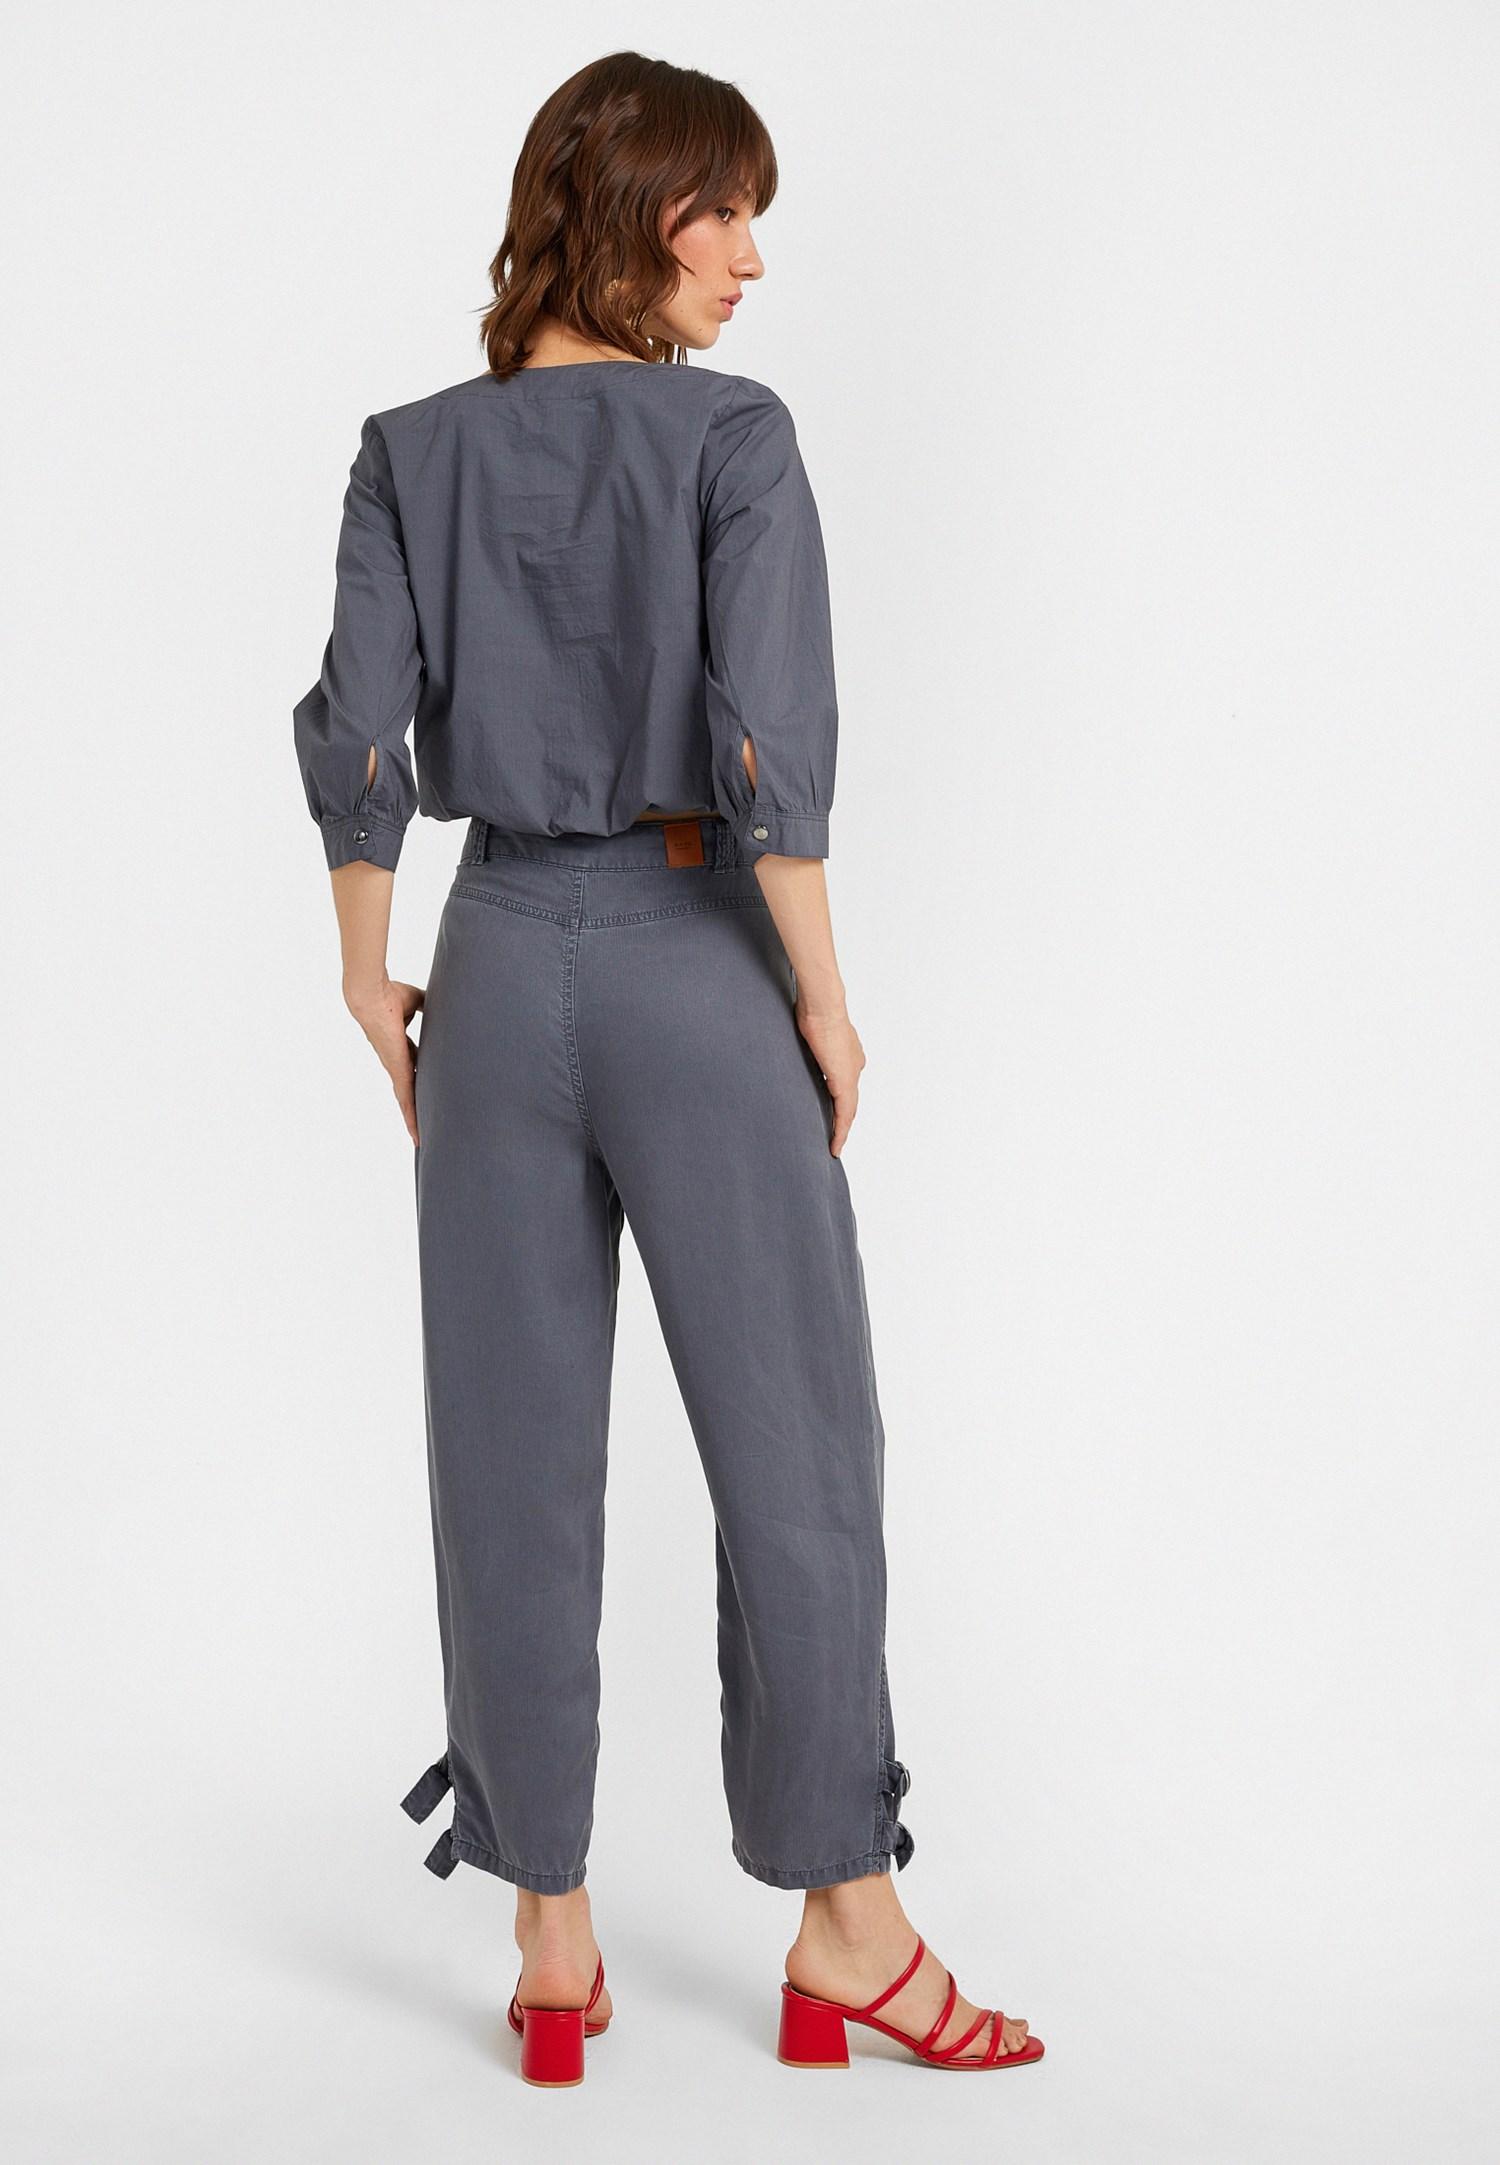 Bayan Gri Paça Detaylı Yüksek Bel Havuç Pantolon